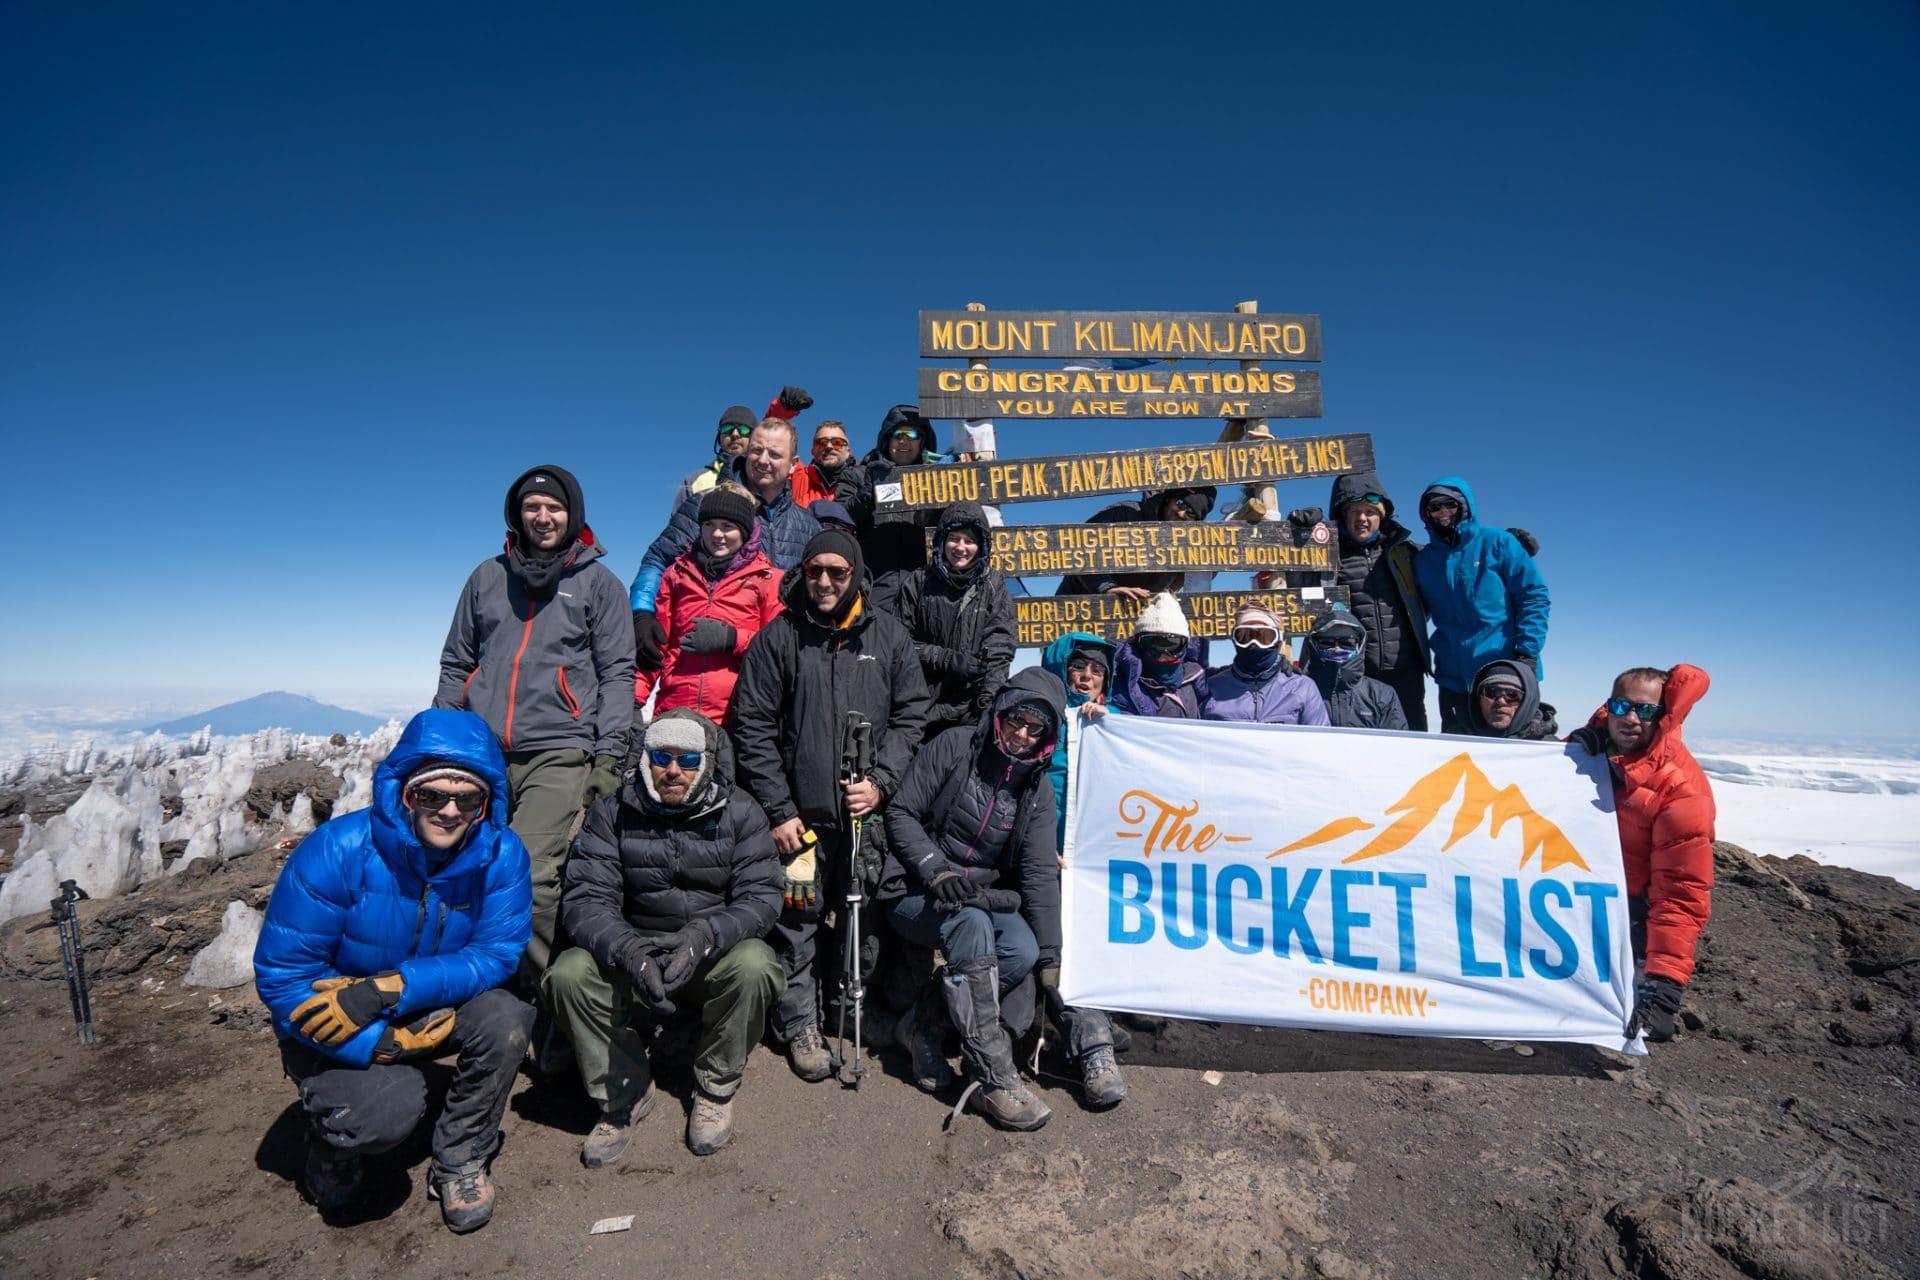 Climbing Kilimanjaro named world's top adventure